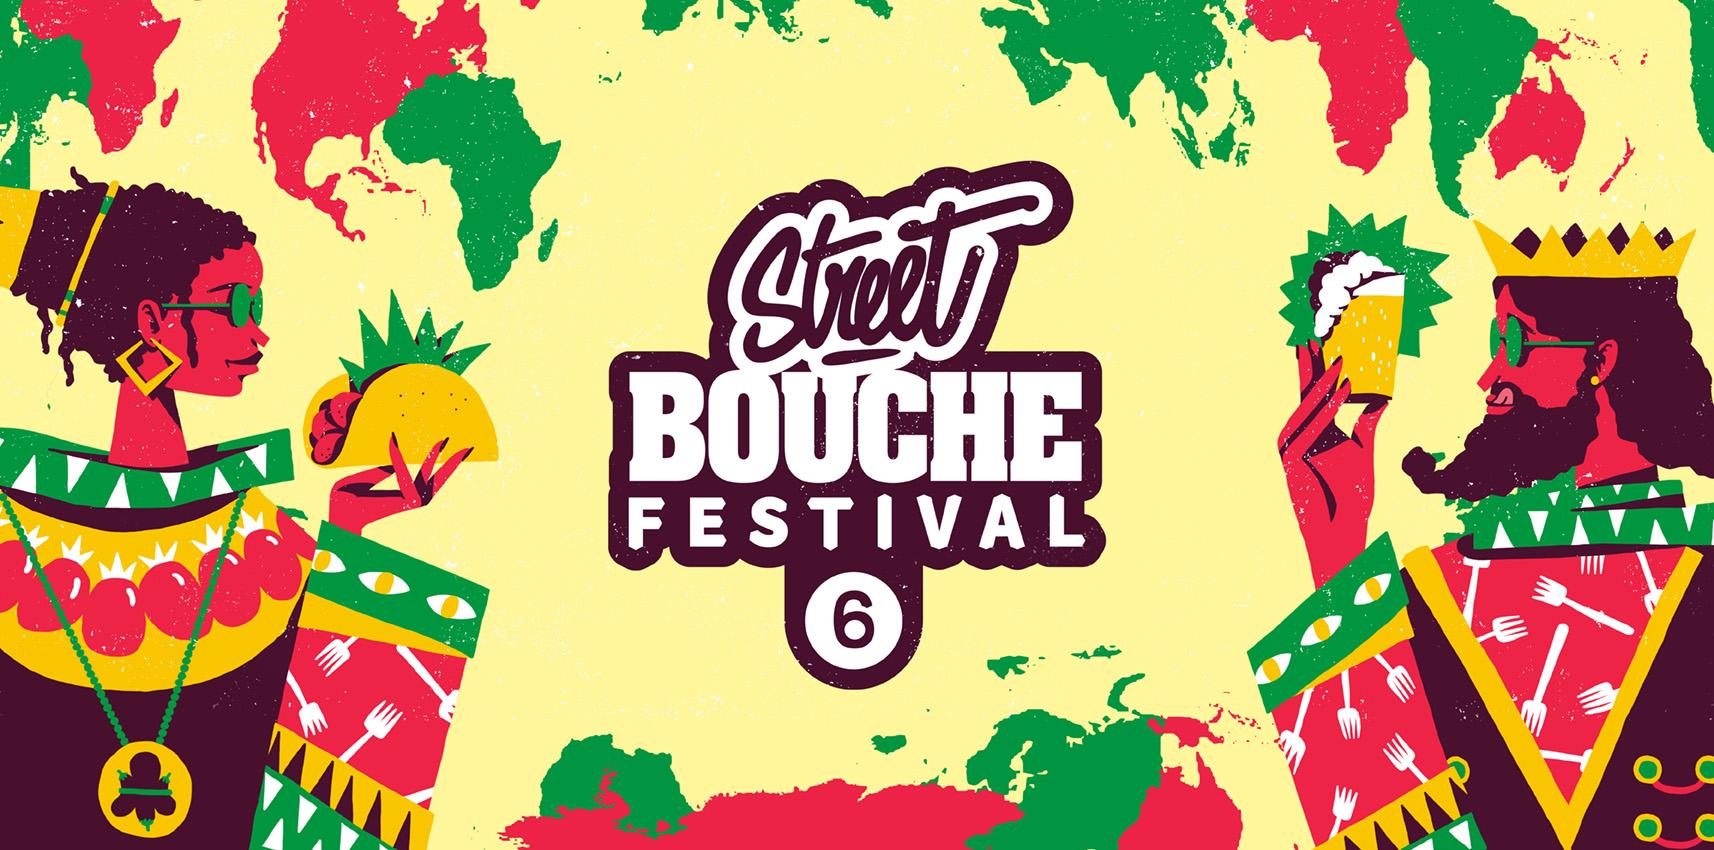 street bouche festival 6 2021 strasbourg universite - Street Bouche